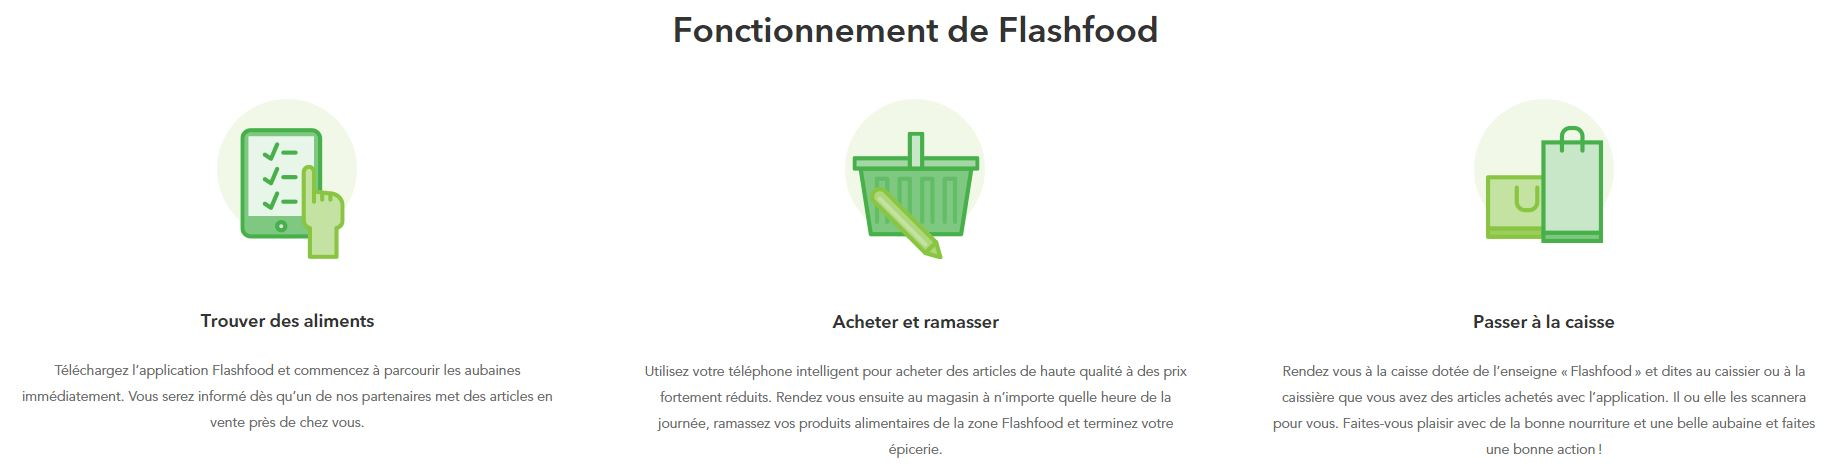 Fonctionnement application Flashfood aliment perime excedentaire